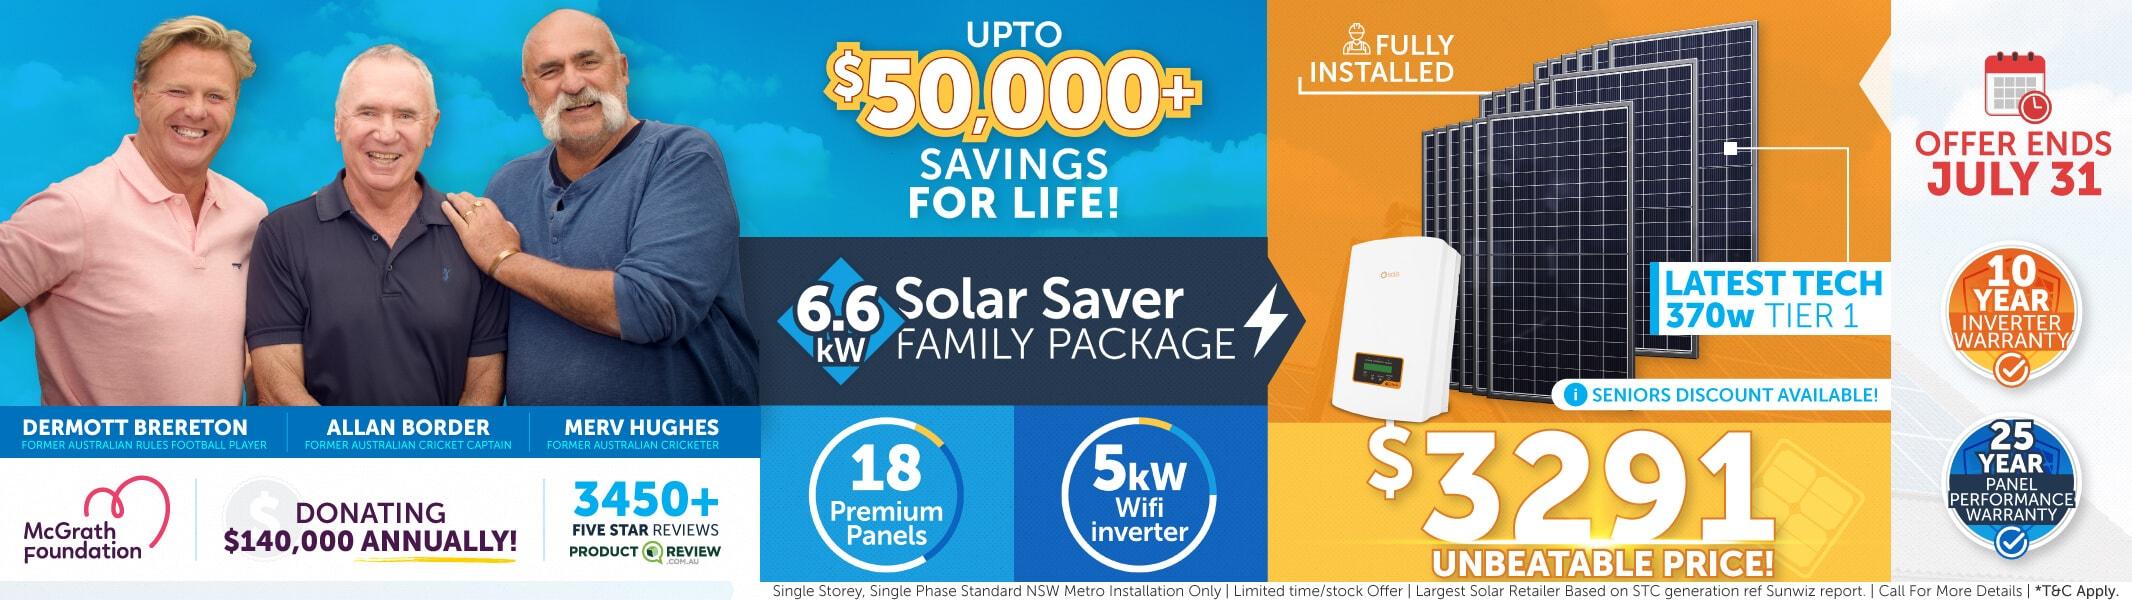 highest 5 star reviewed solar provider Sunboost